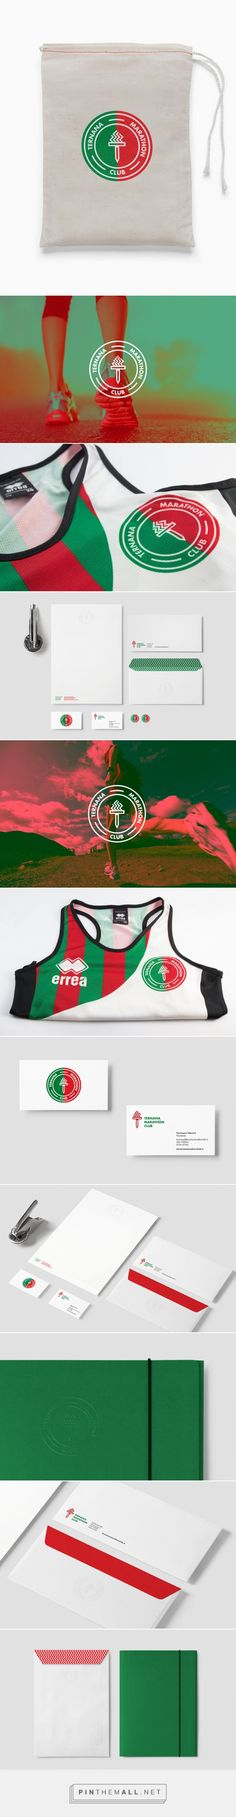 Ternana Marathon Club | Bocanegra Design Studio Identity designed for a running team bocanegrastudio.com #identity #logo #branding #brandidentity #logodesign #stationery #visualidentity